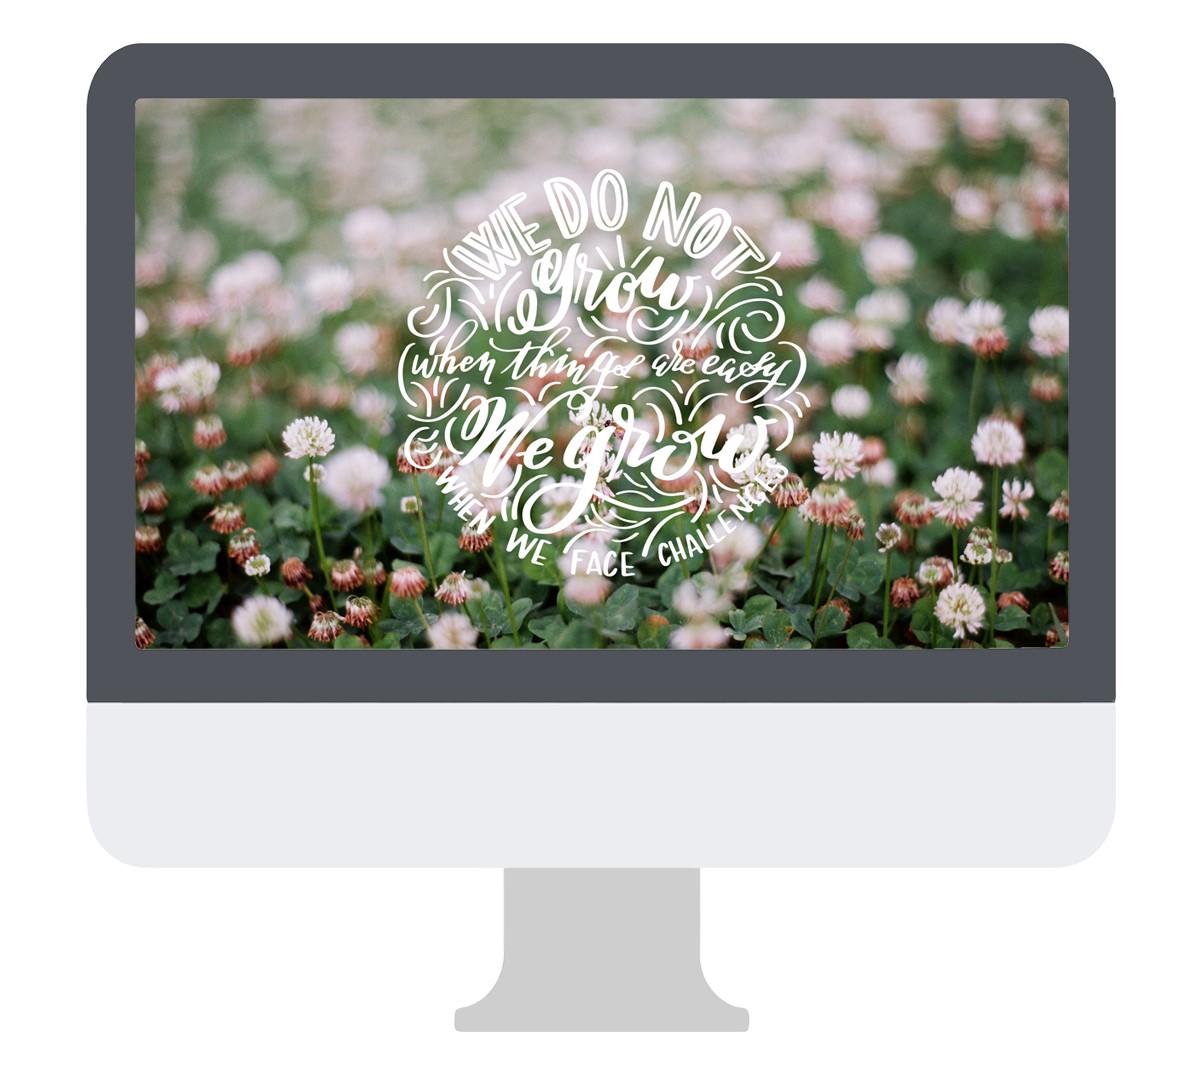 Desktop_Artwork_WeDoNotGrow_OMAC.jpg